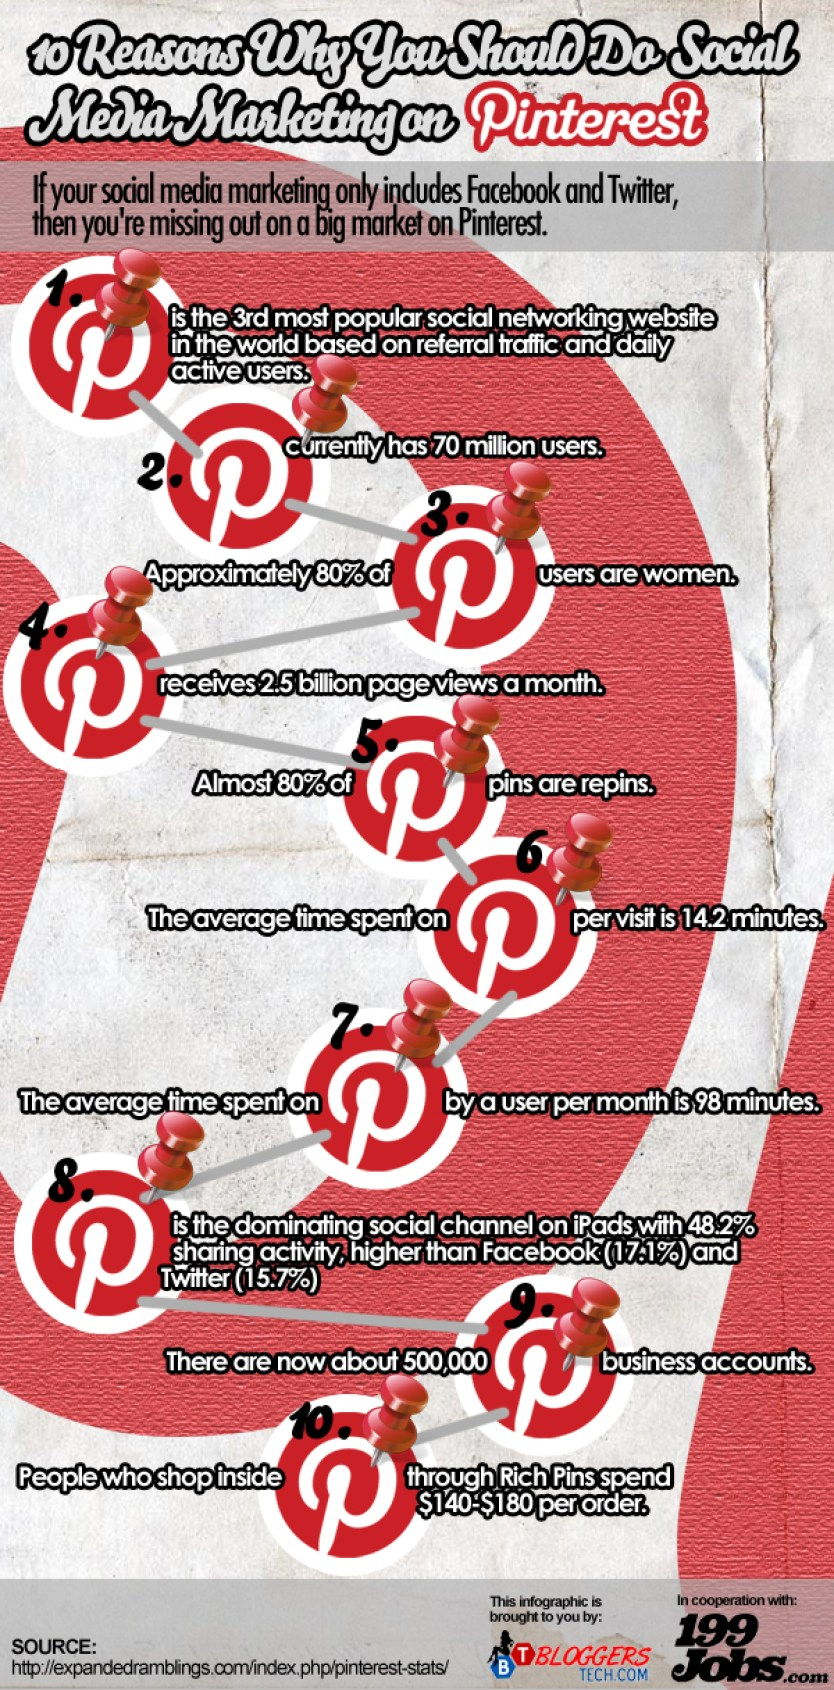 10 razones para usar Pinterest en Marketing